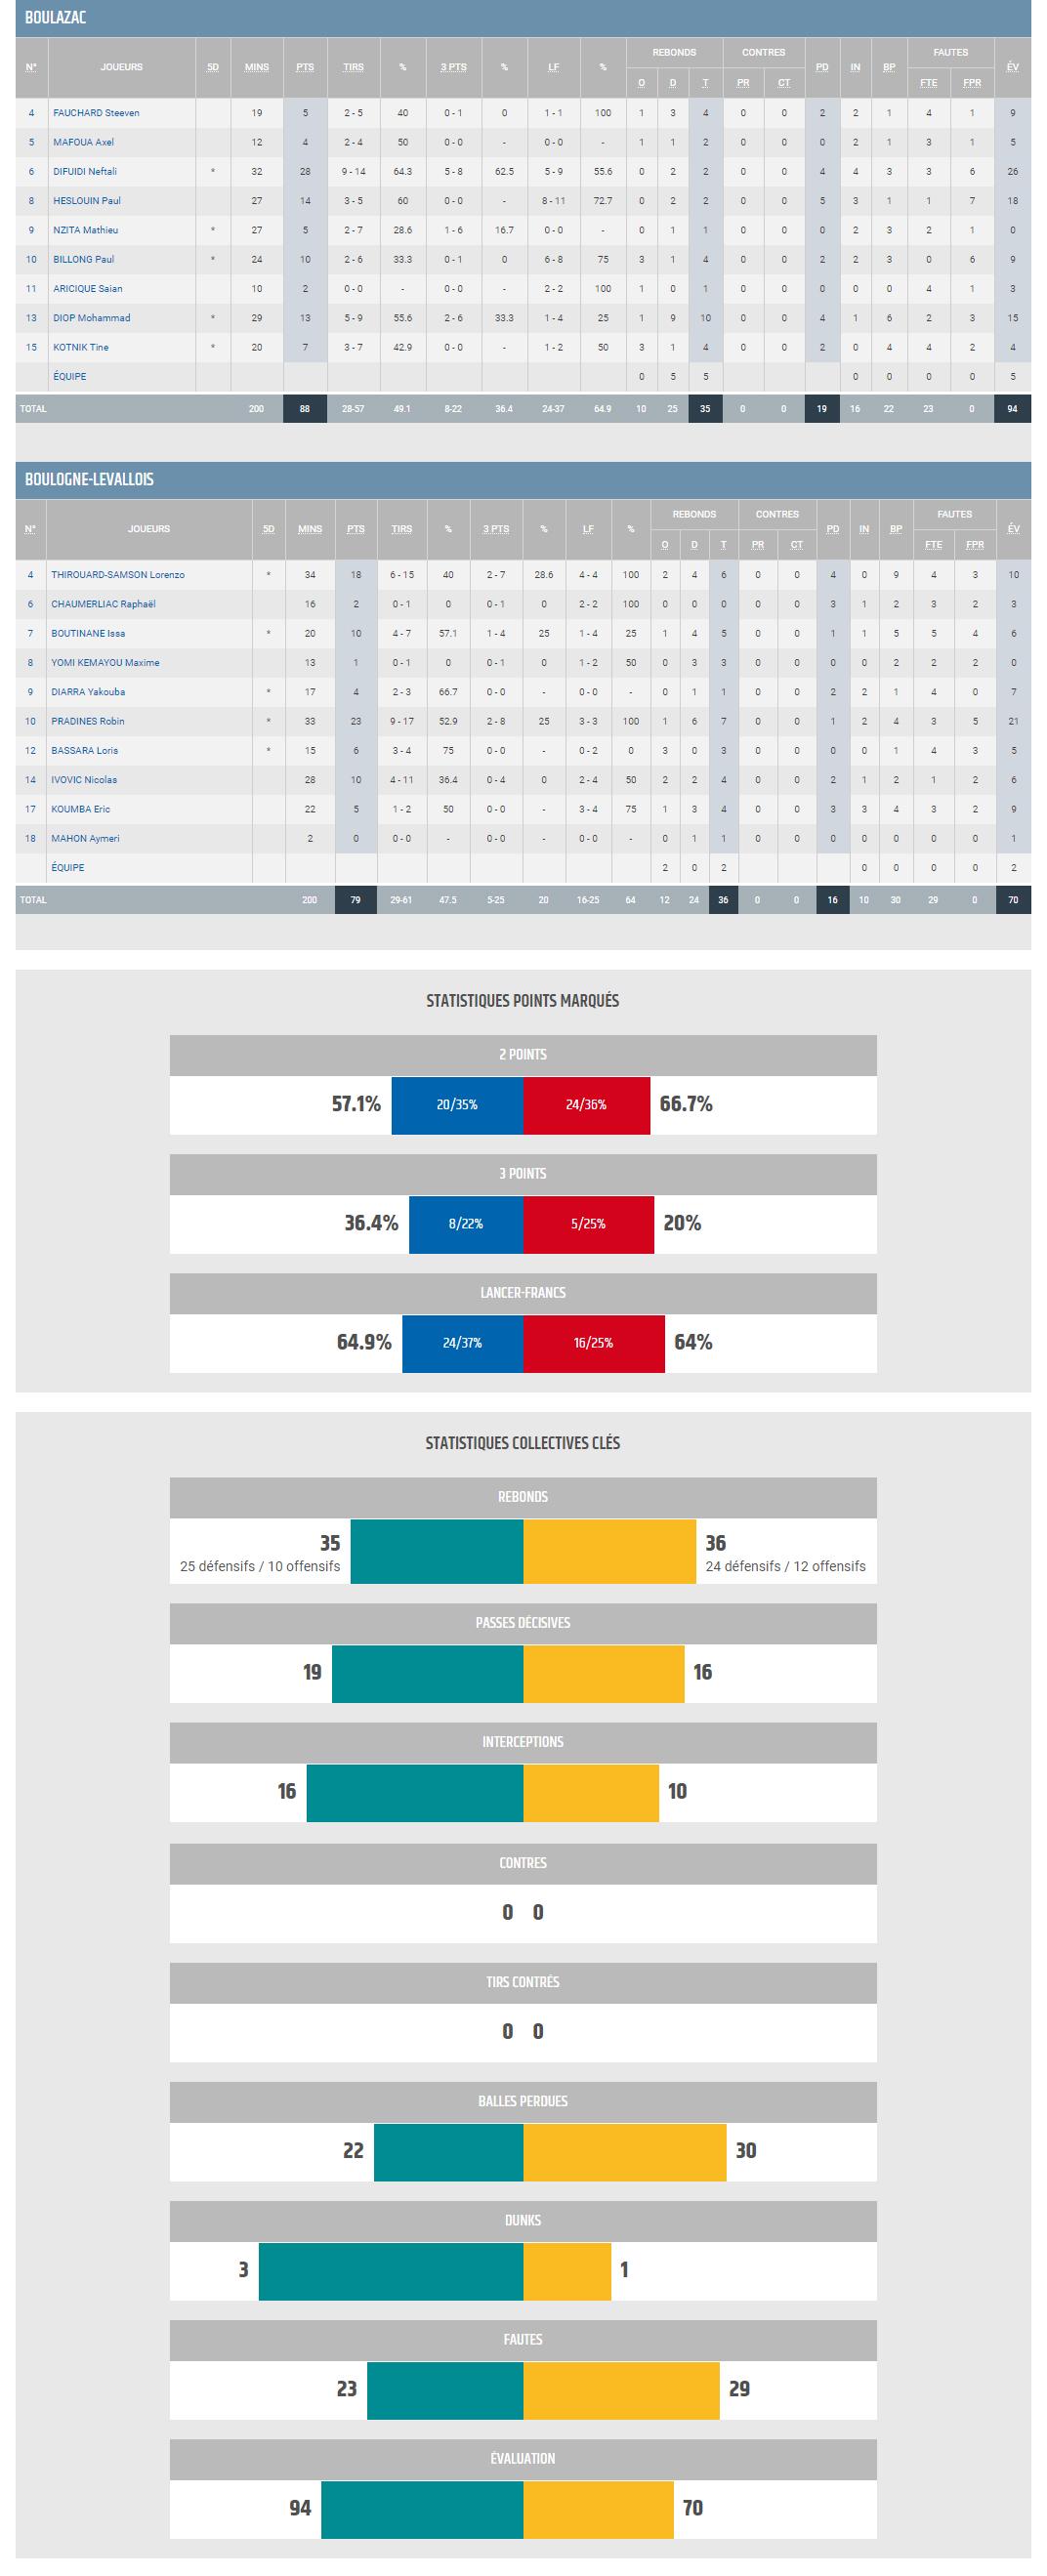 BBD vs Levallois_Stats